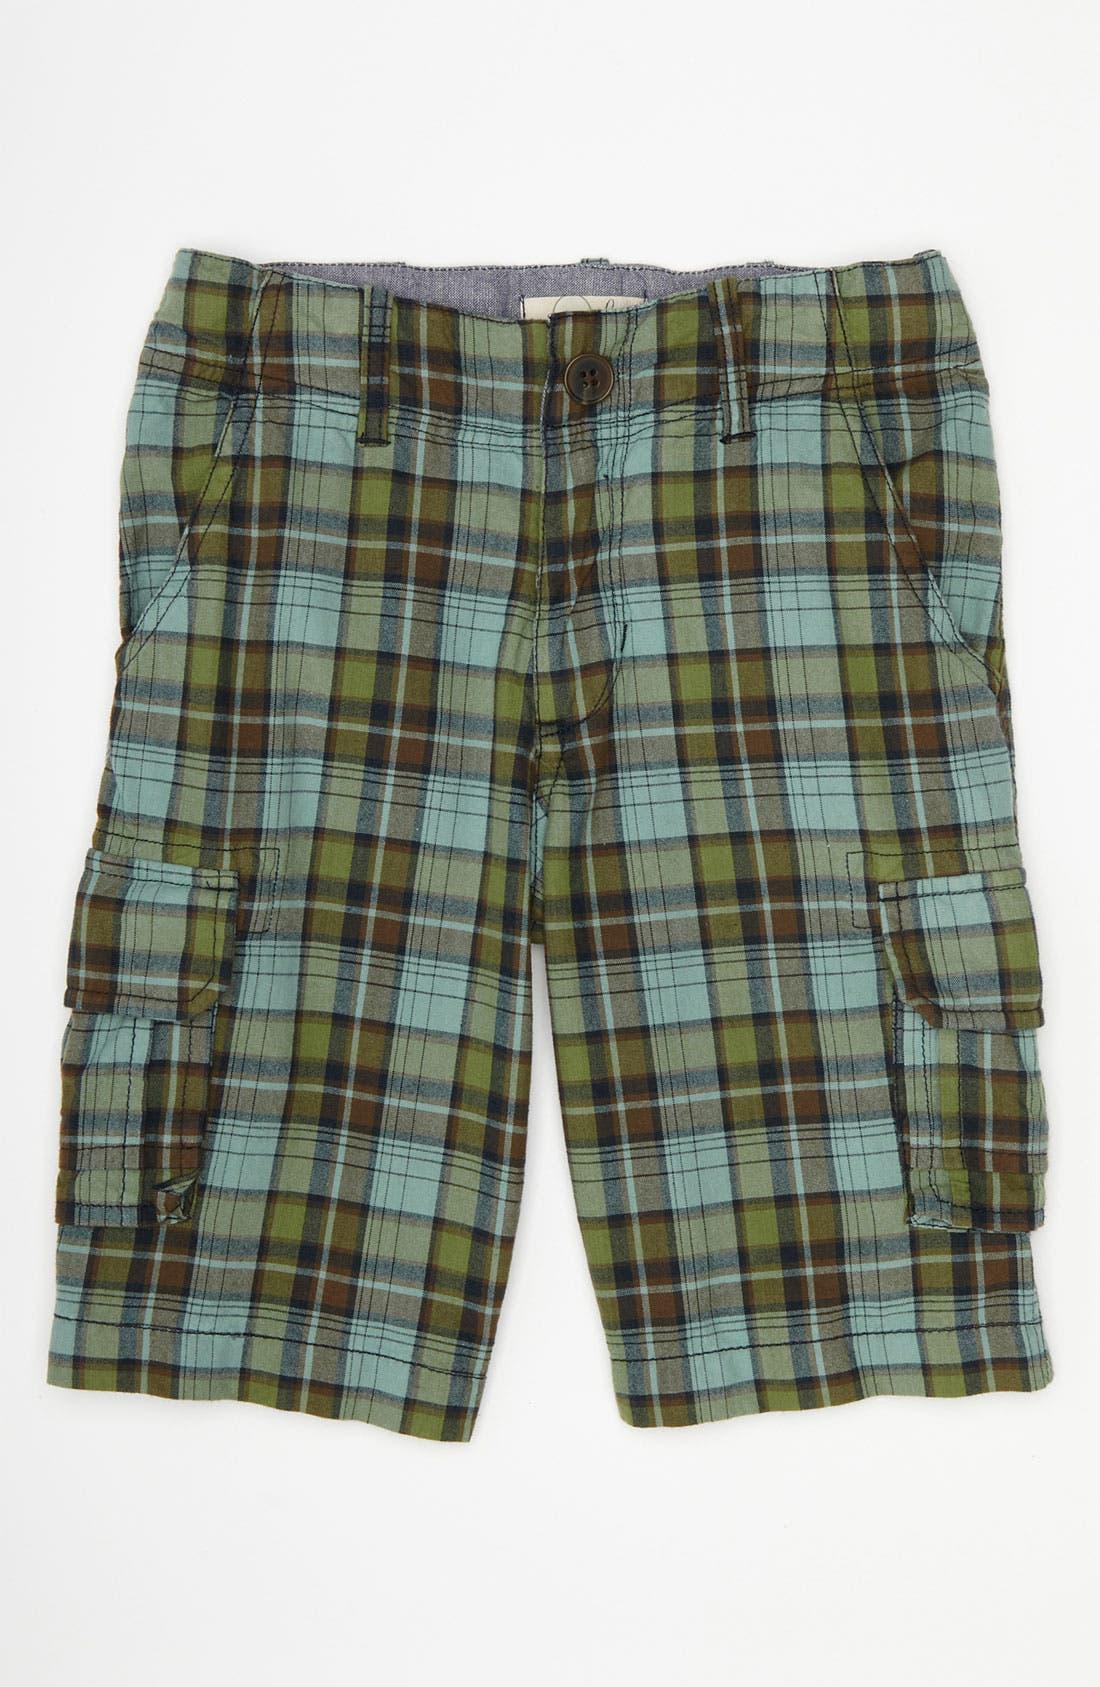 Main Image - Peek 'Havasu' Trail Shorts (Toddler, Little Boys & Big Boys)